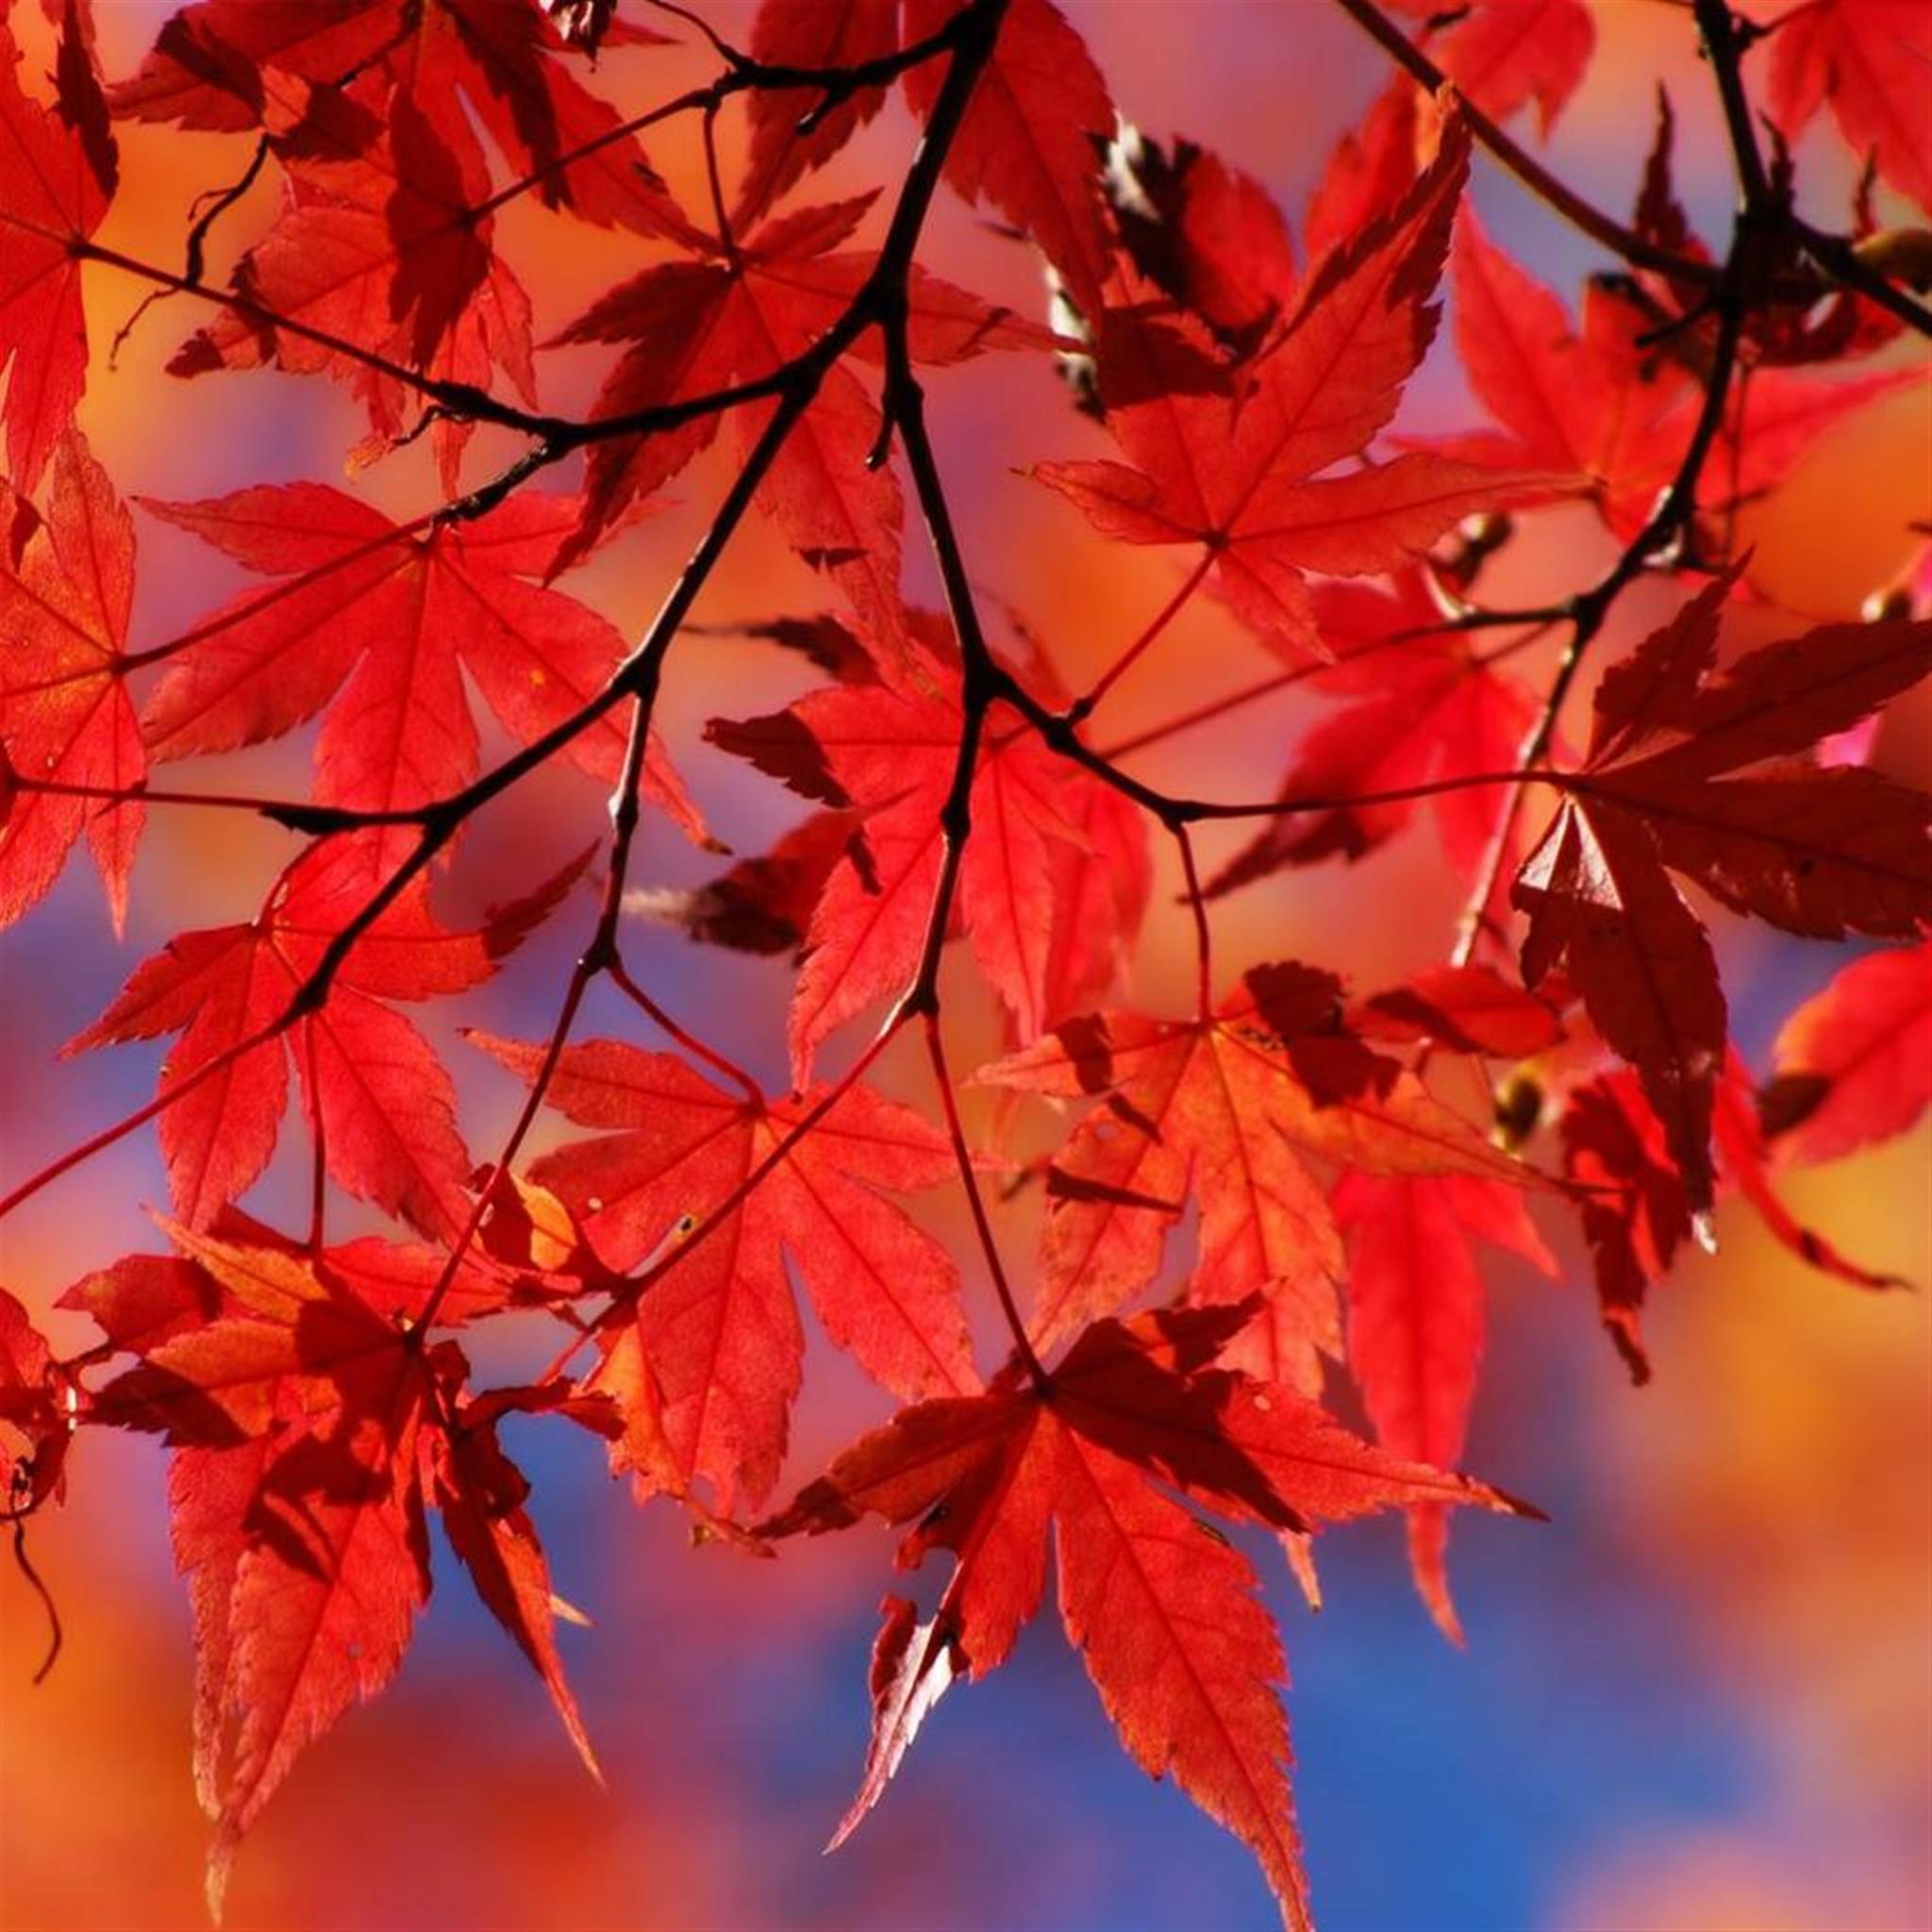 Beautiful-Autumn-Red-Maple-Leaf-Branch-ipad-air-wallpaper-ilikewallpaper_com.jpg